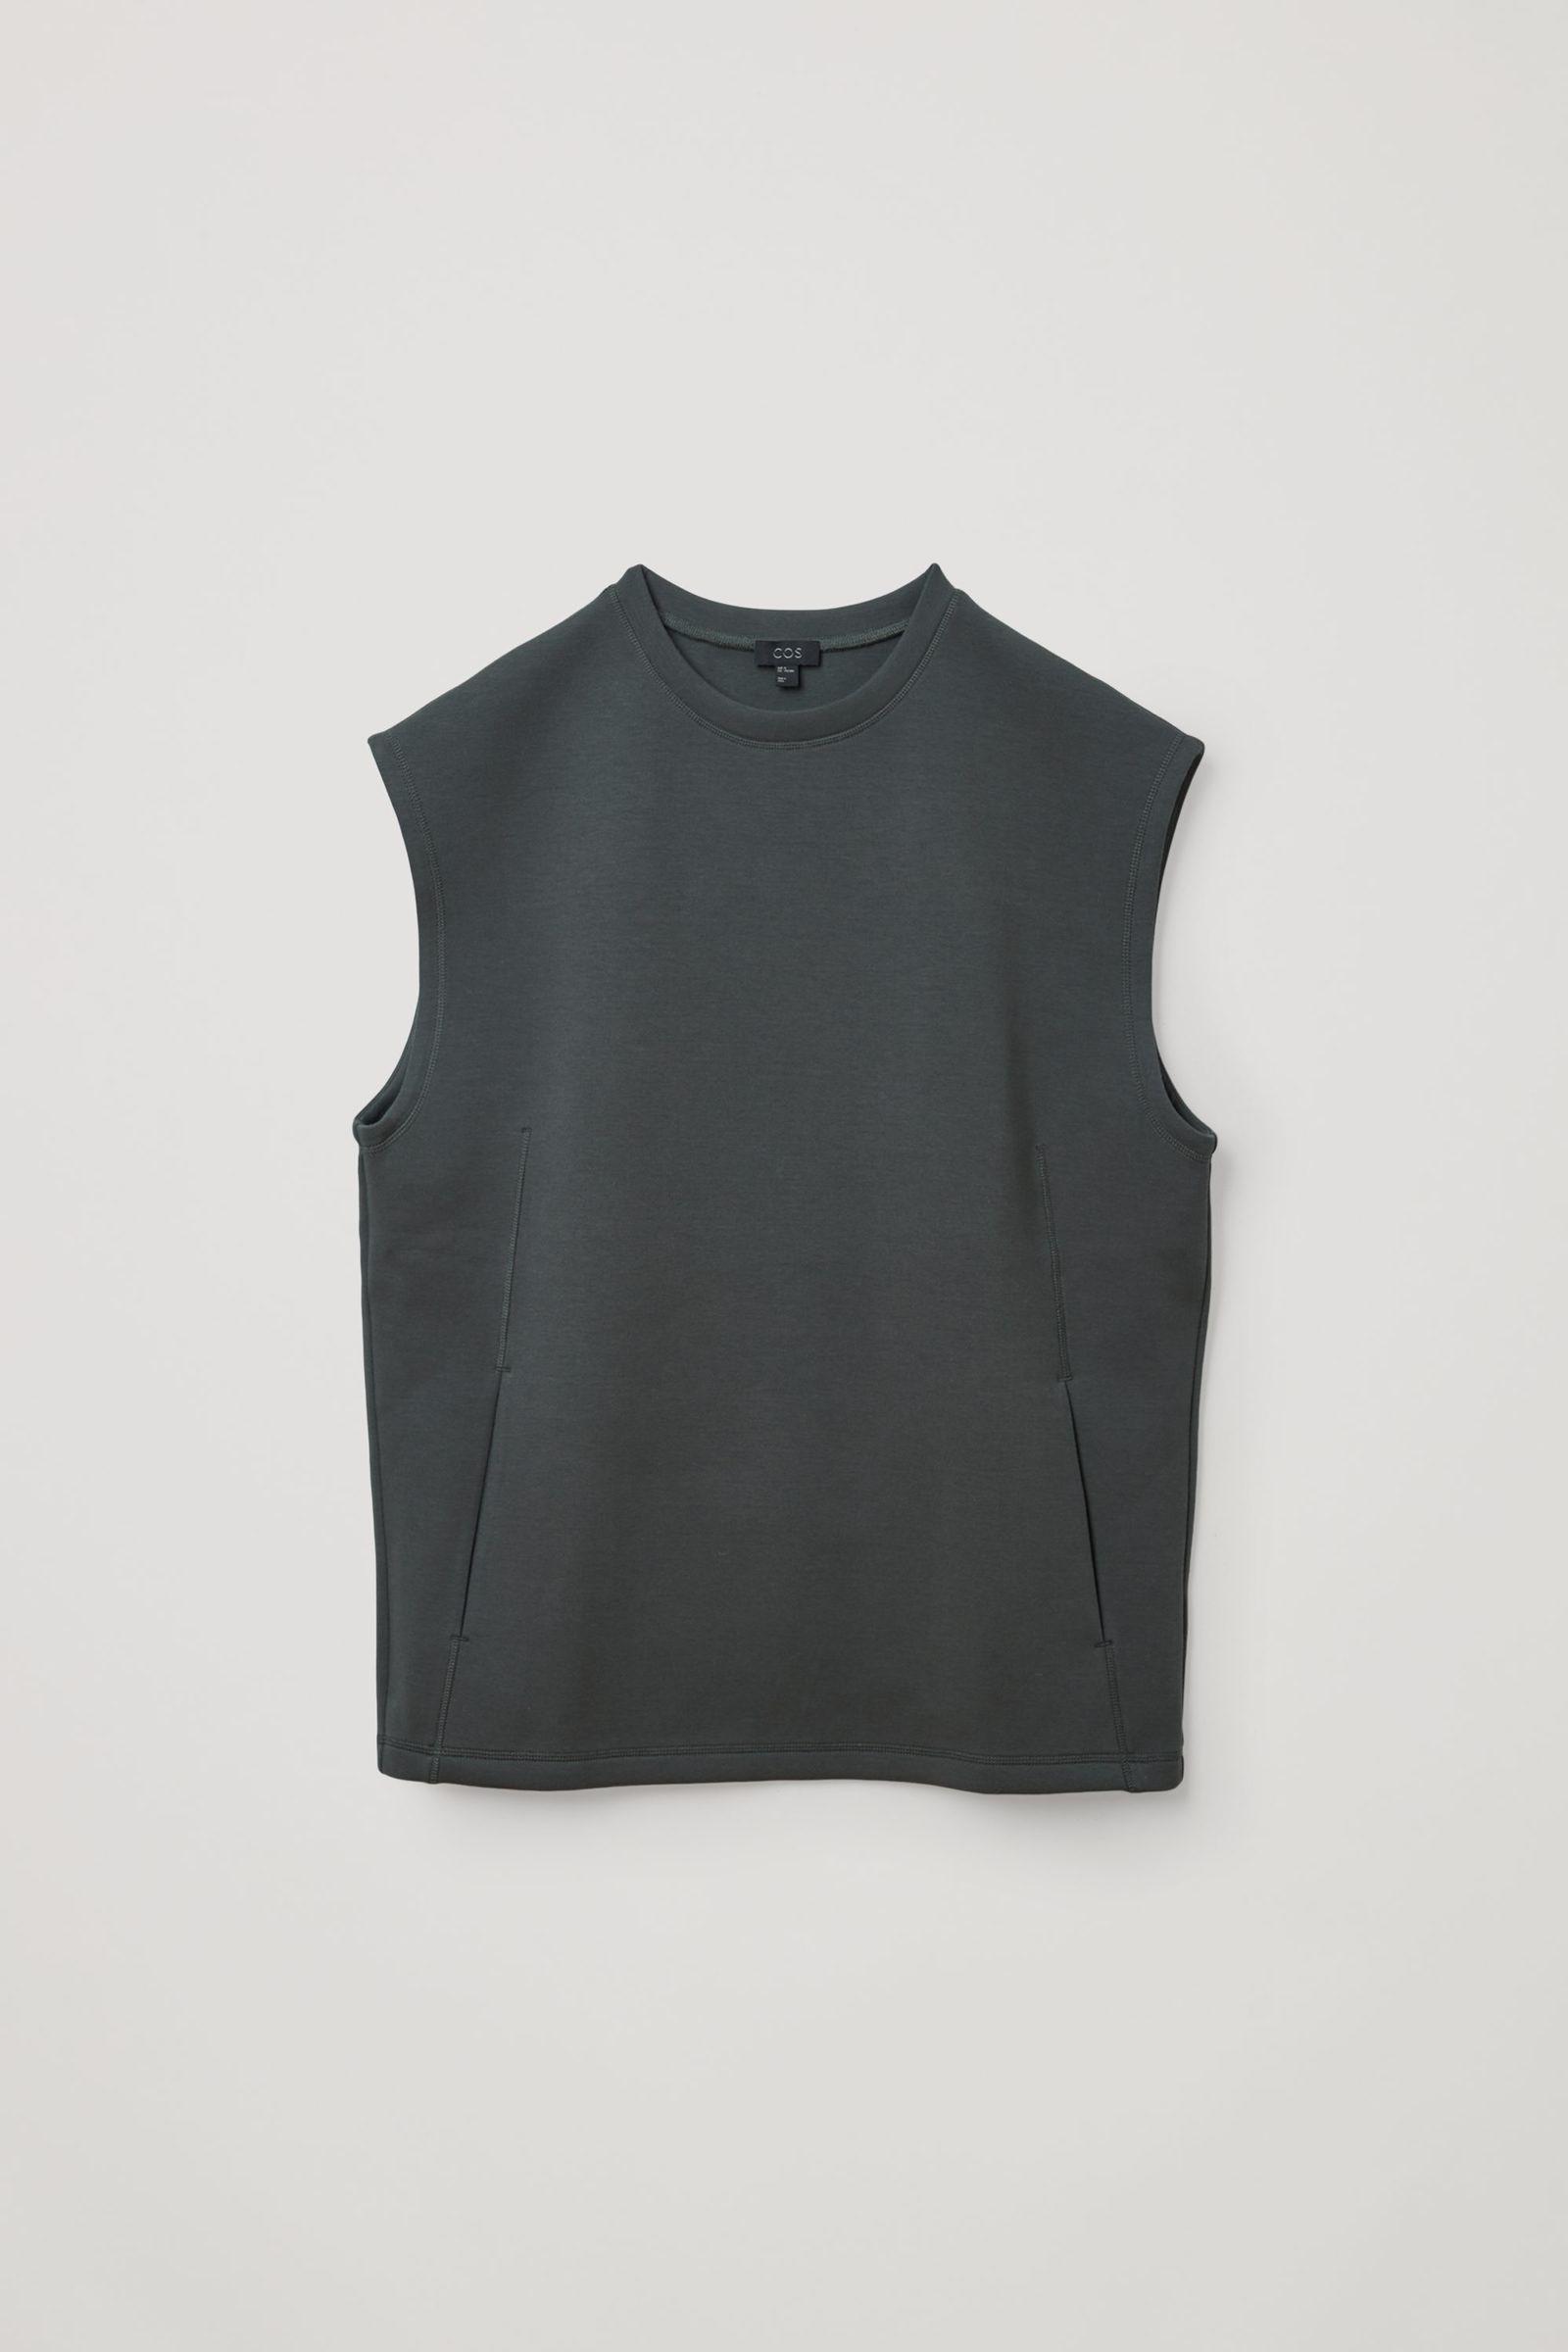 COS 오가닉 코튼 스쿠버 티셔츠의 그린컬러 Product입니다.